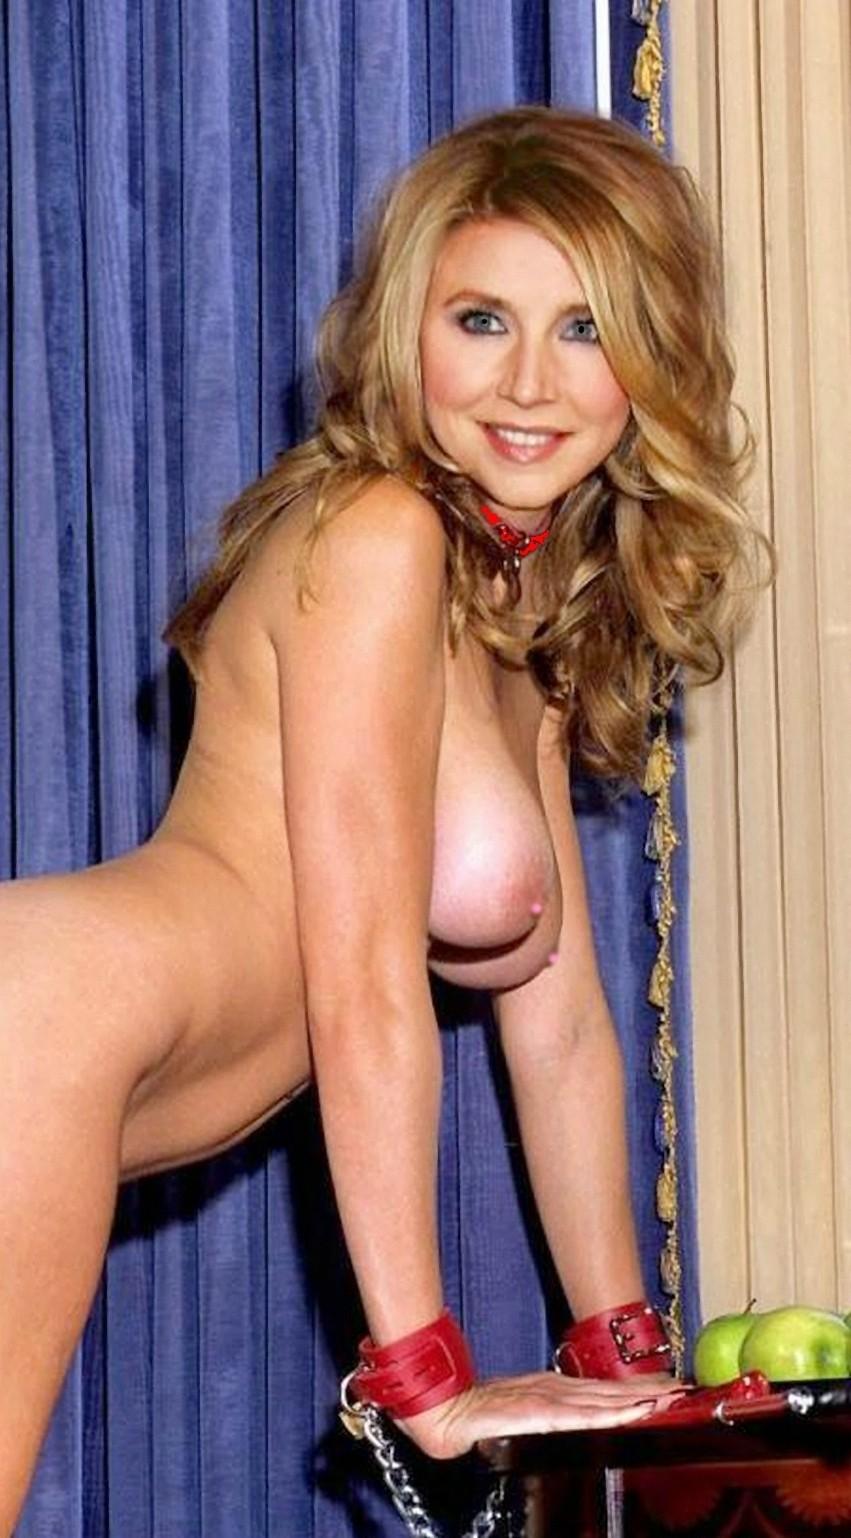 Sarah chalke nudes